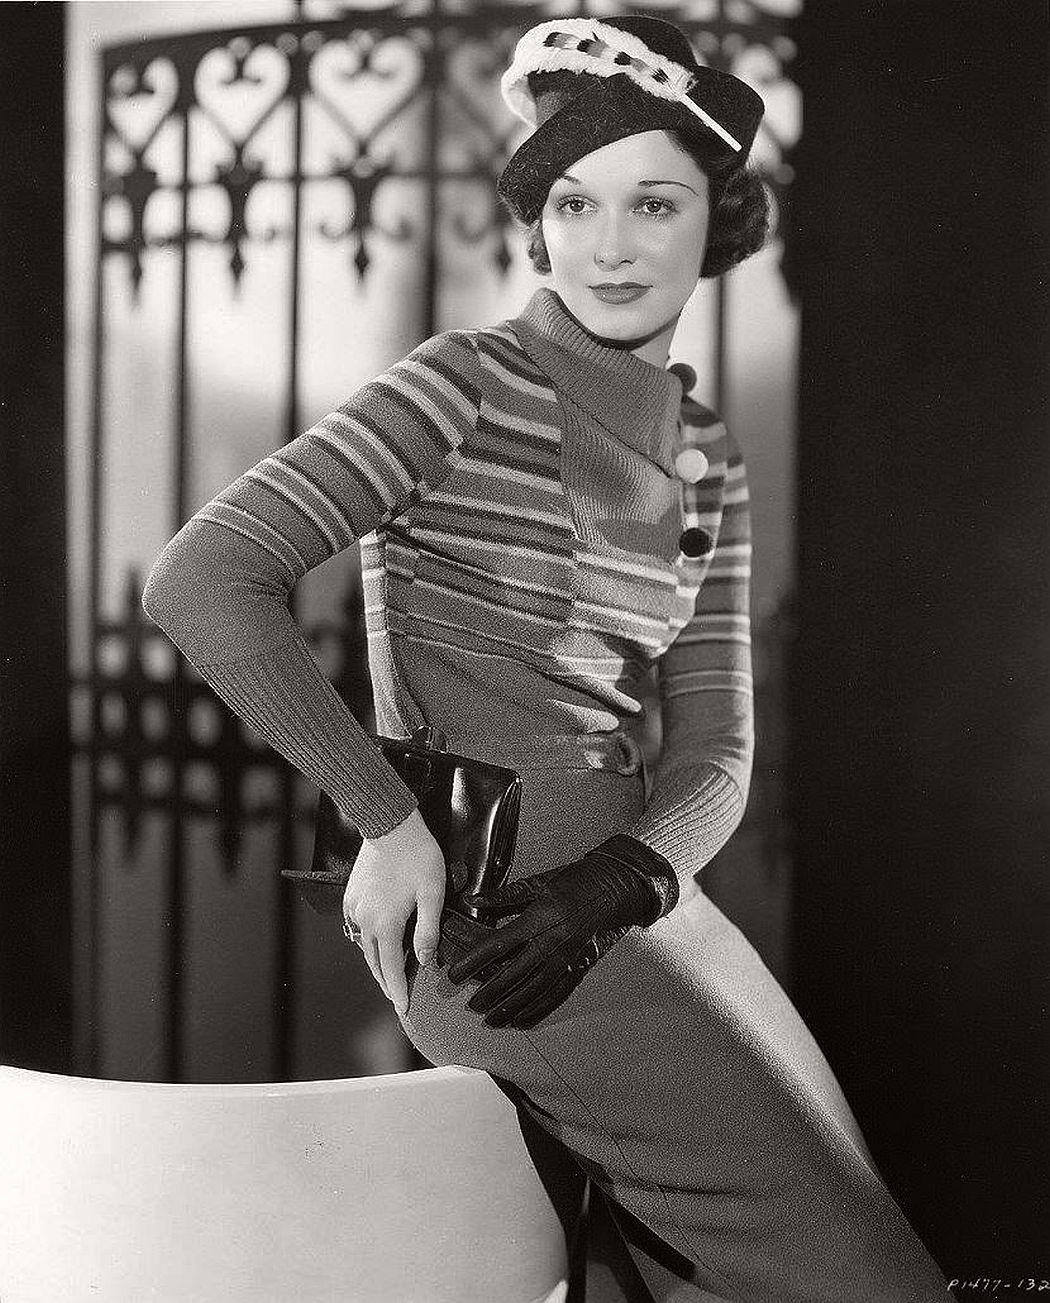 vintage-black-white-portrait-hollywood-movie-actress-1930s-Frances-Drake-2